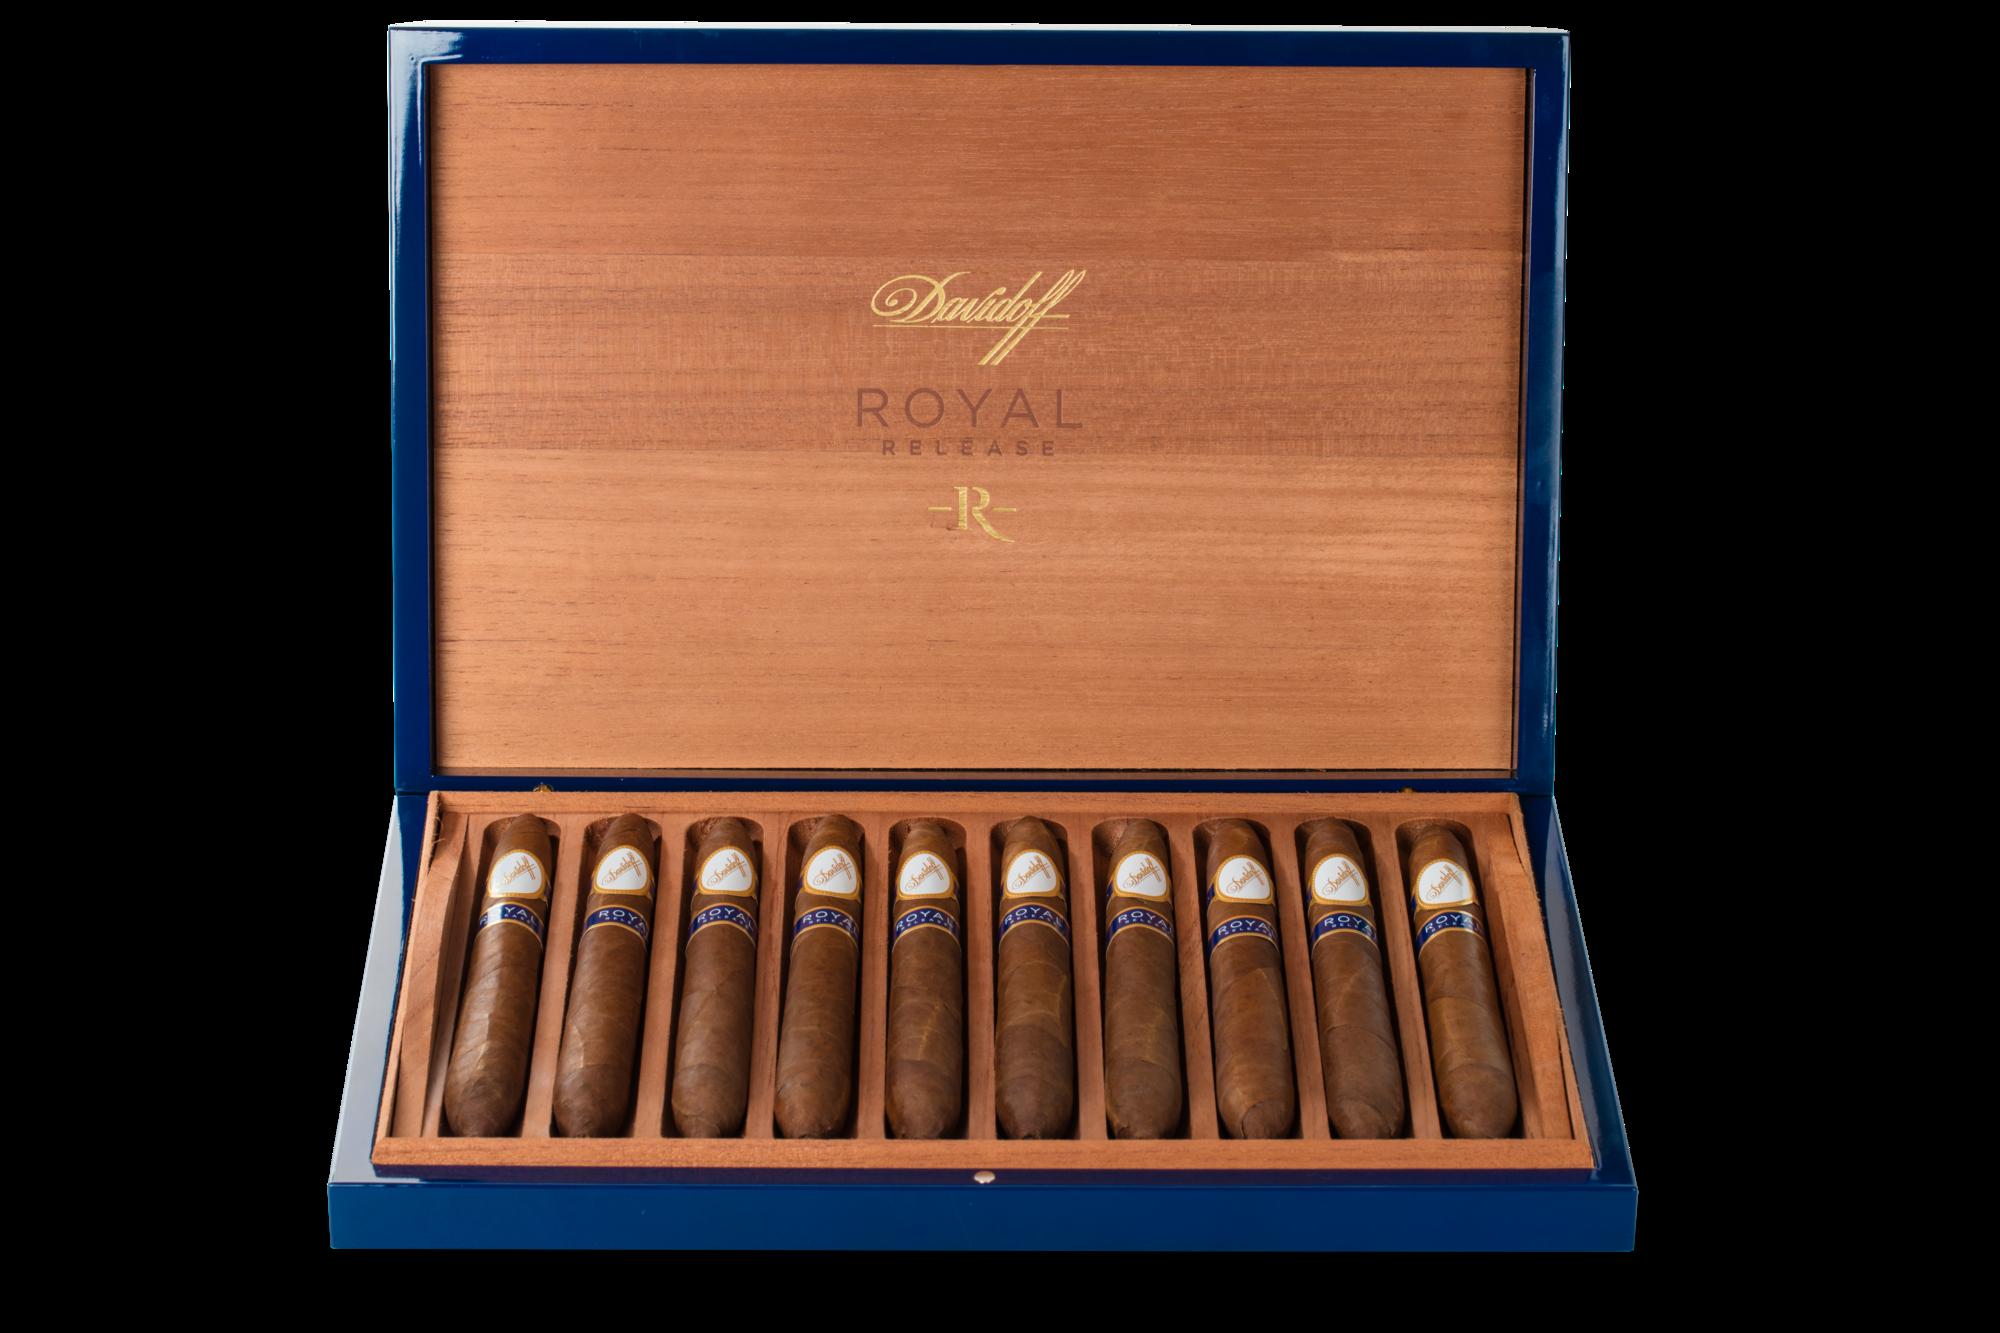 Davidoff Royal Release Salomones box